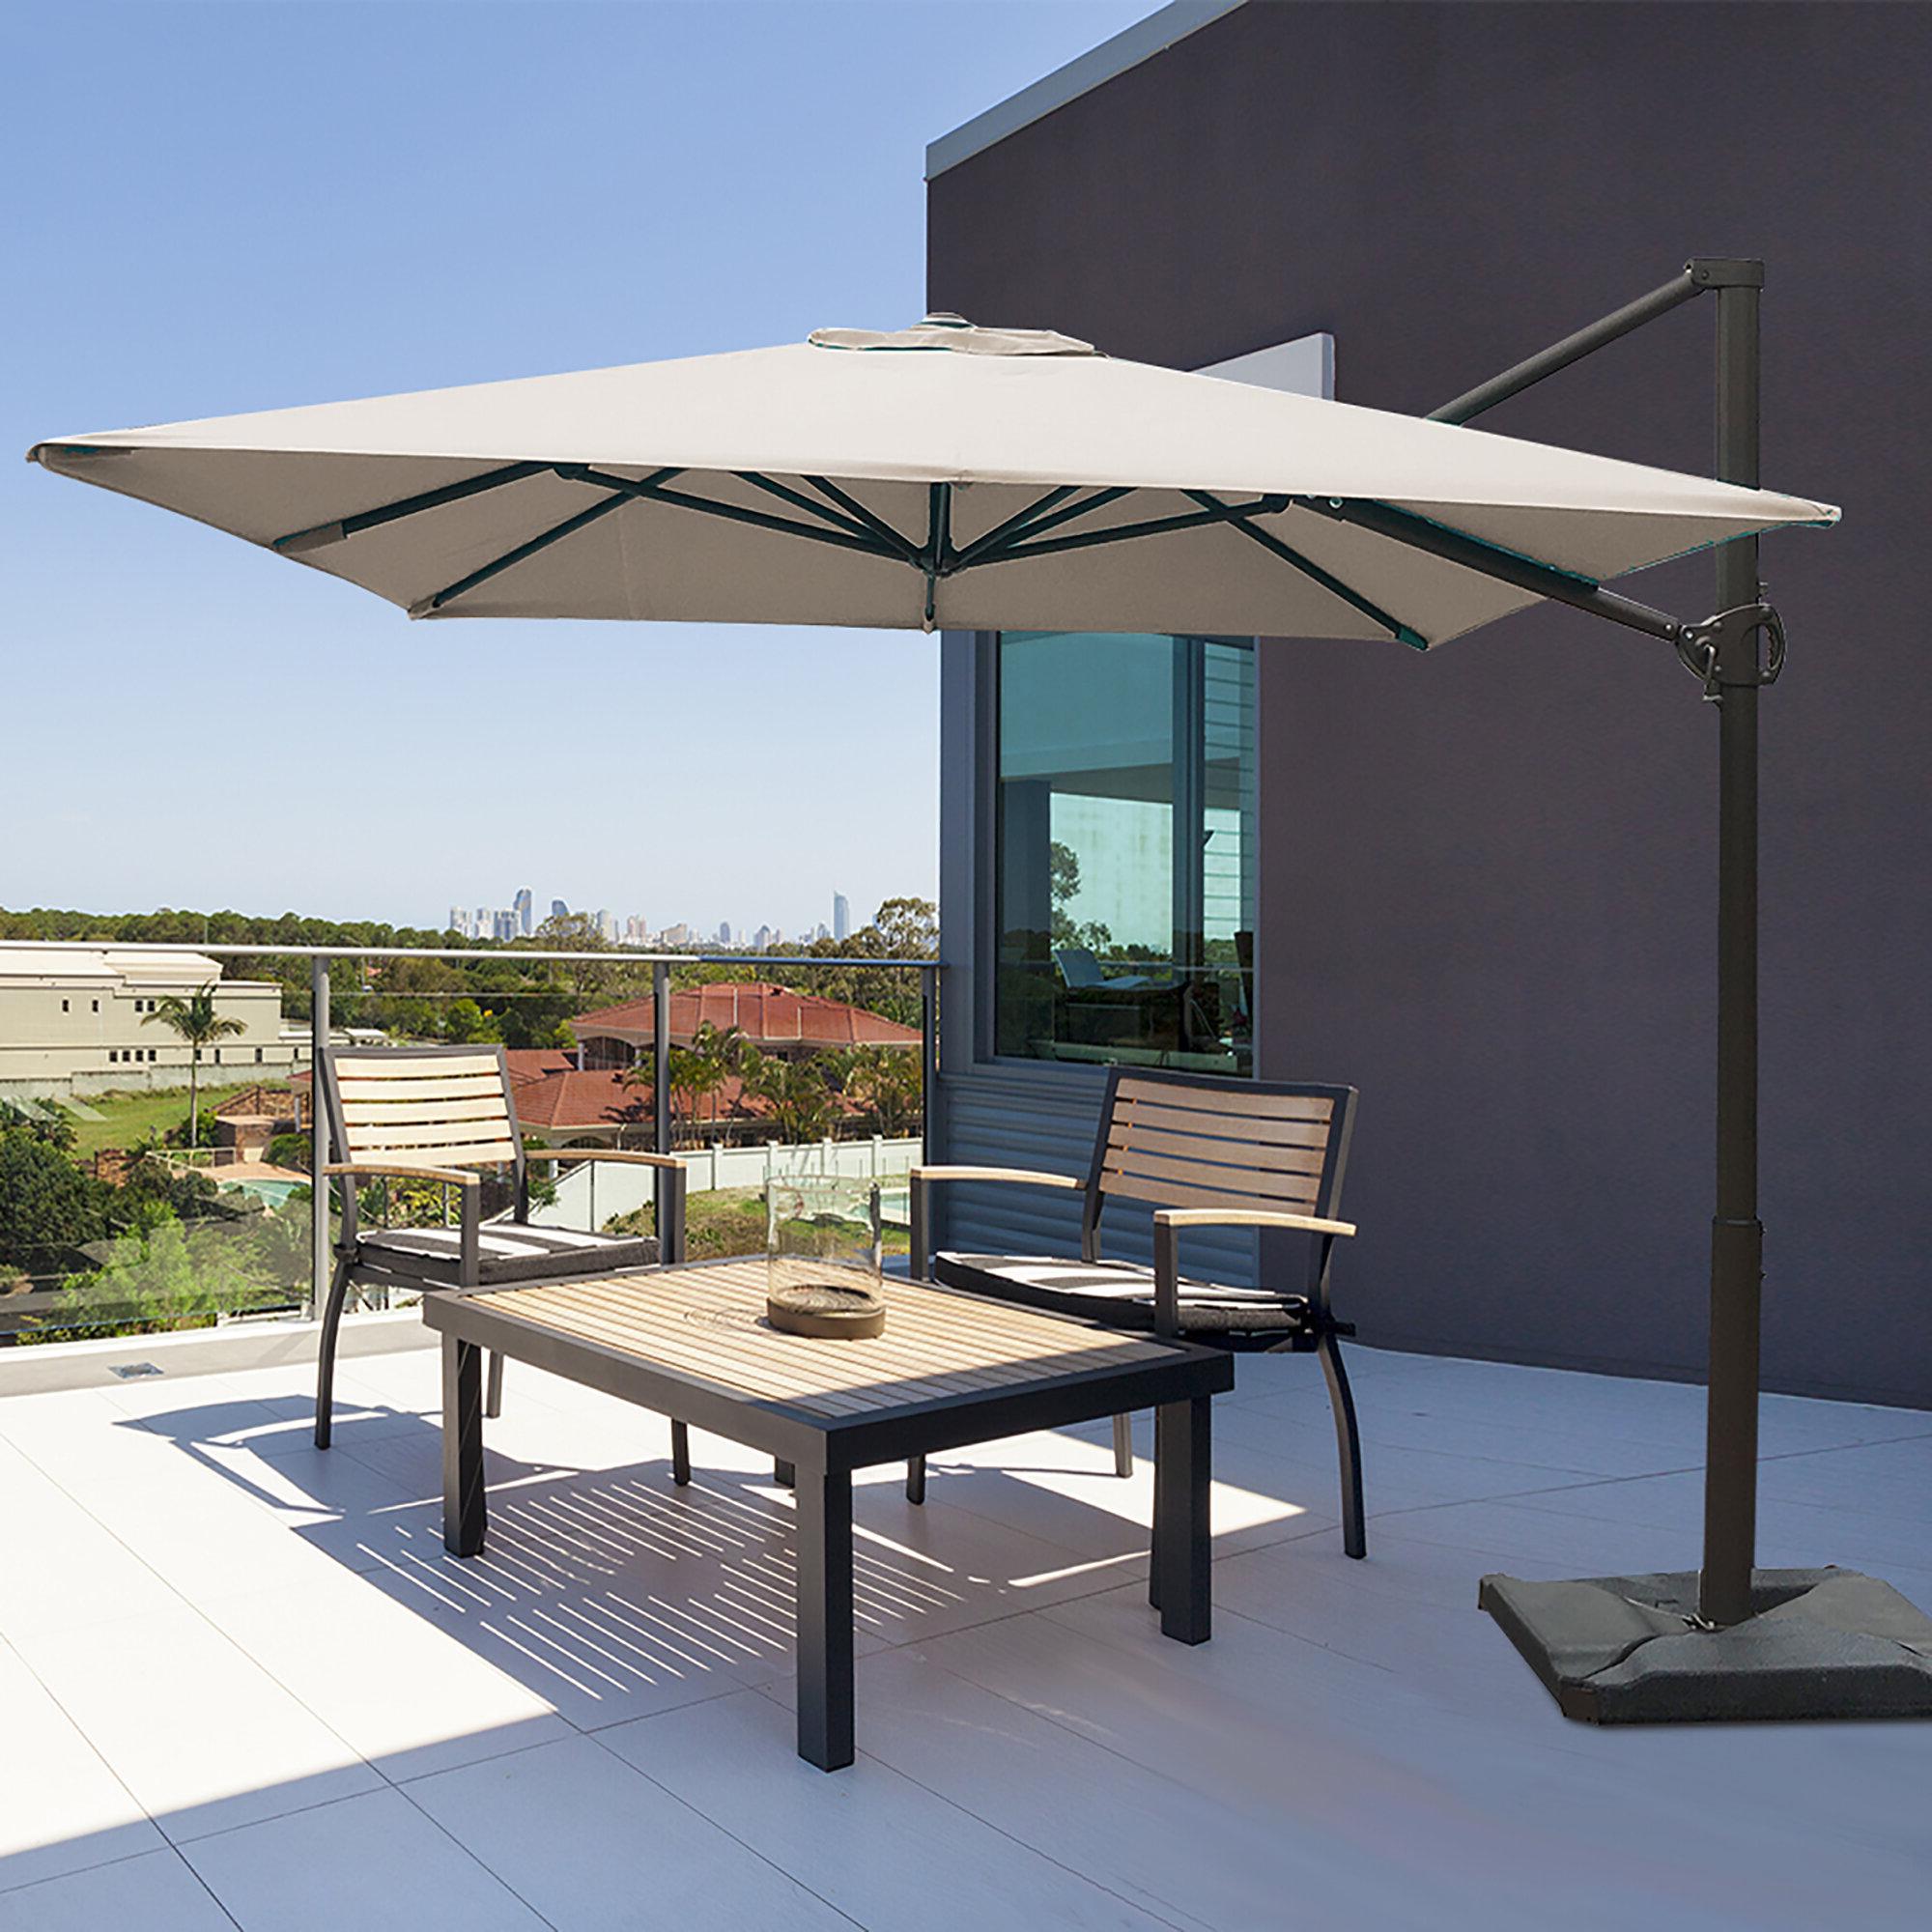 Cantilever Umbrellas Regarding Recent Fordwich 8' X 10' Rectangular Cantilever Umbrella (View 11 of 20)